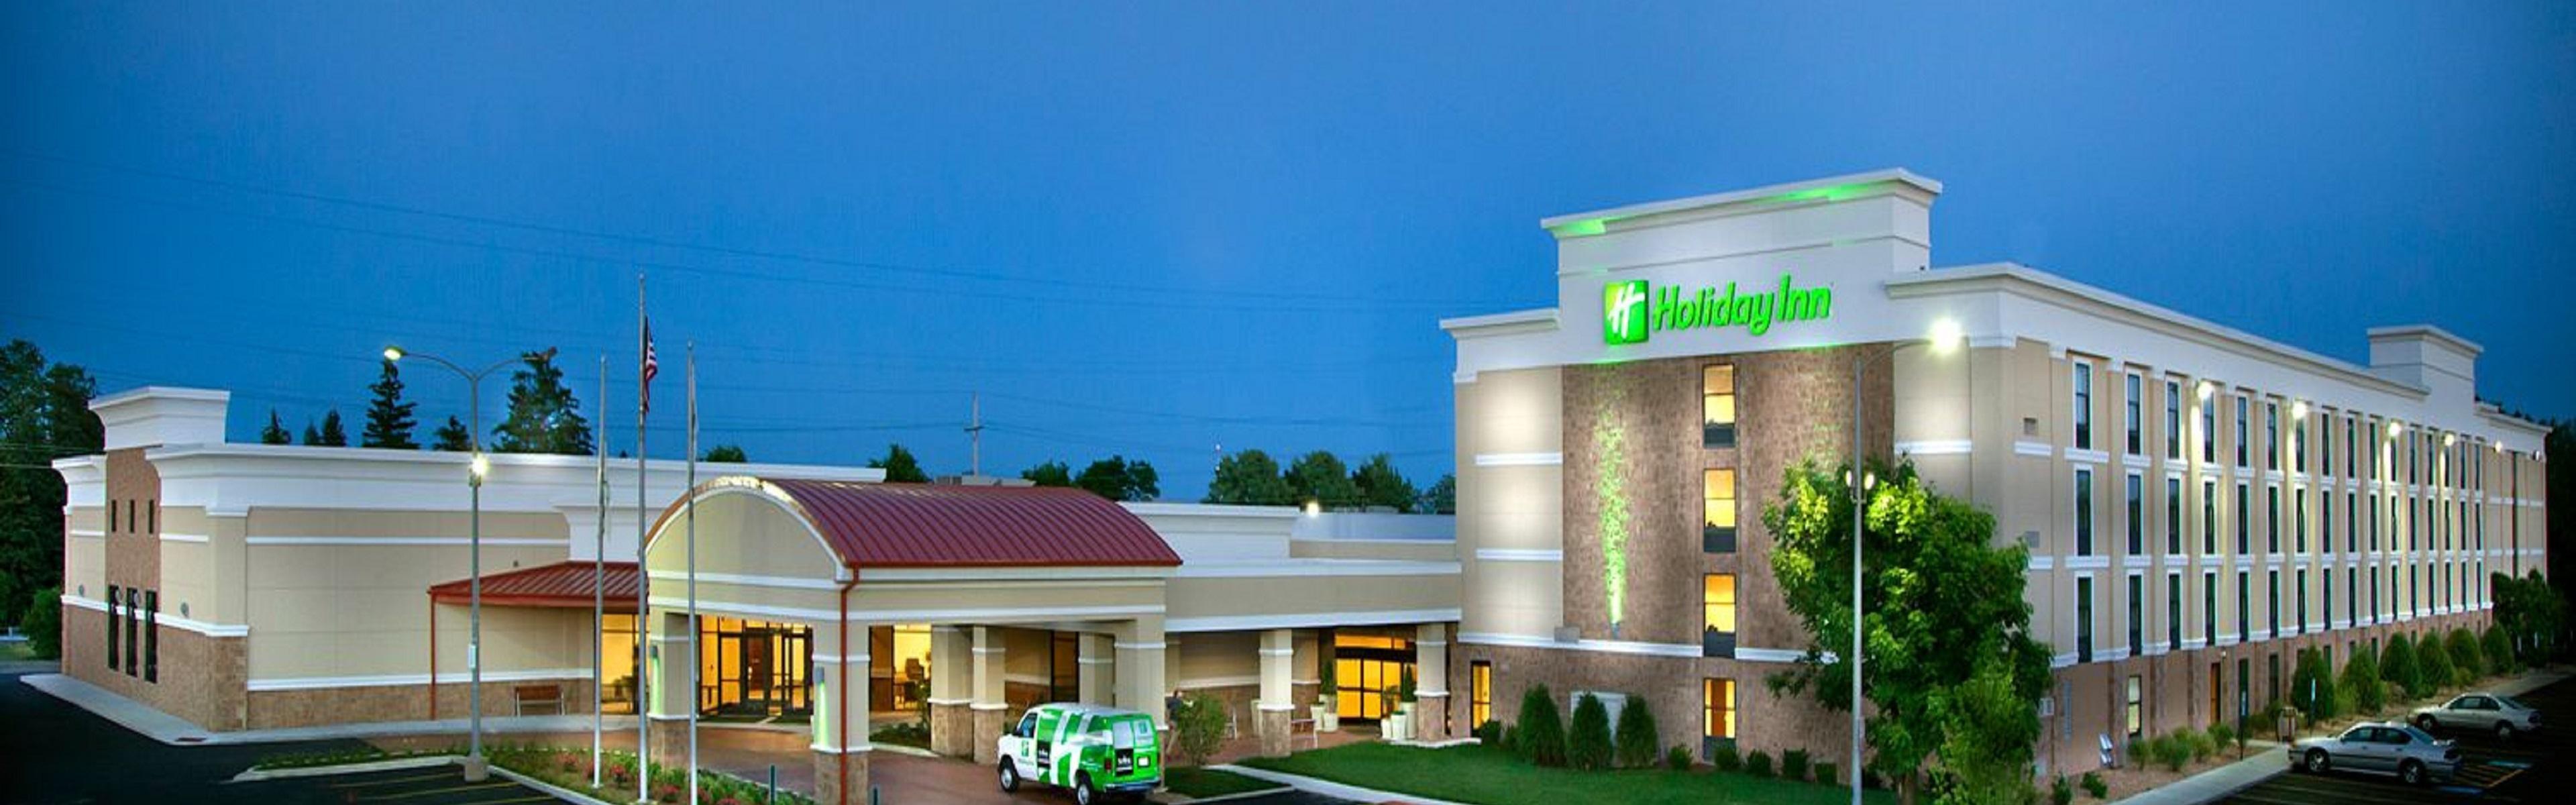 Holiday Inn Gurnee Convention Center image 0